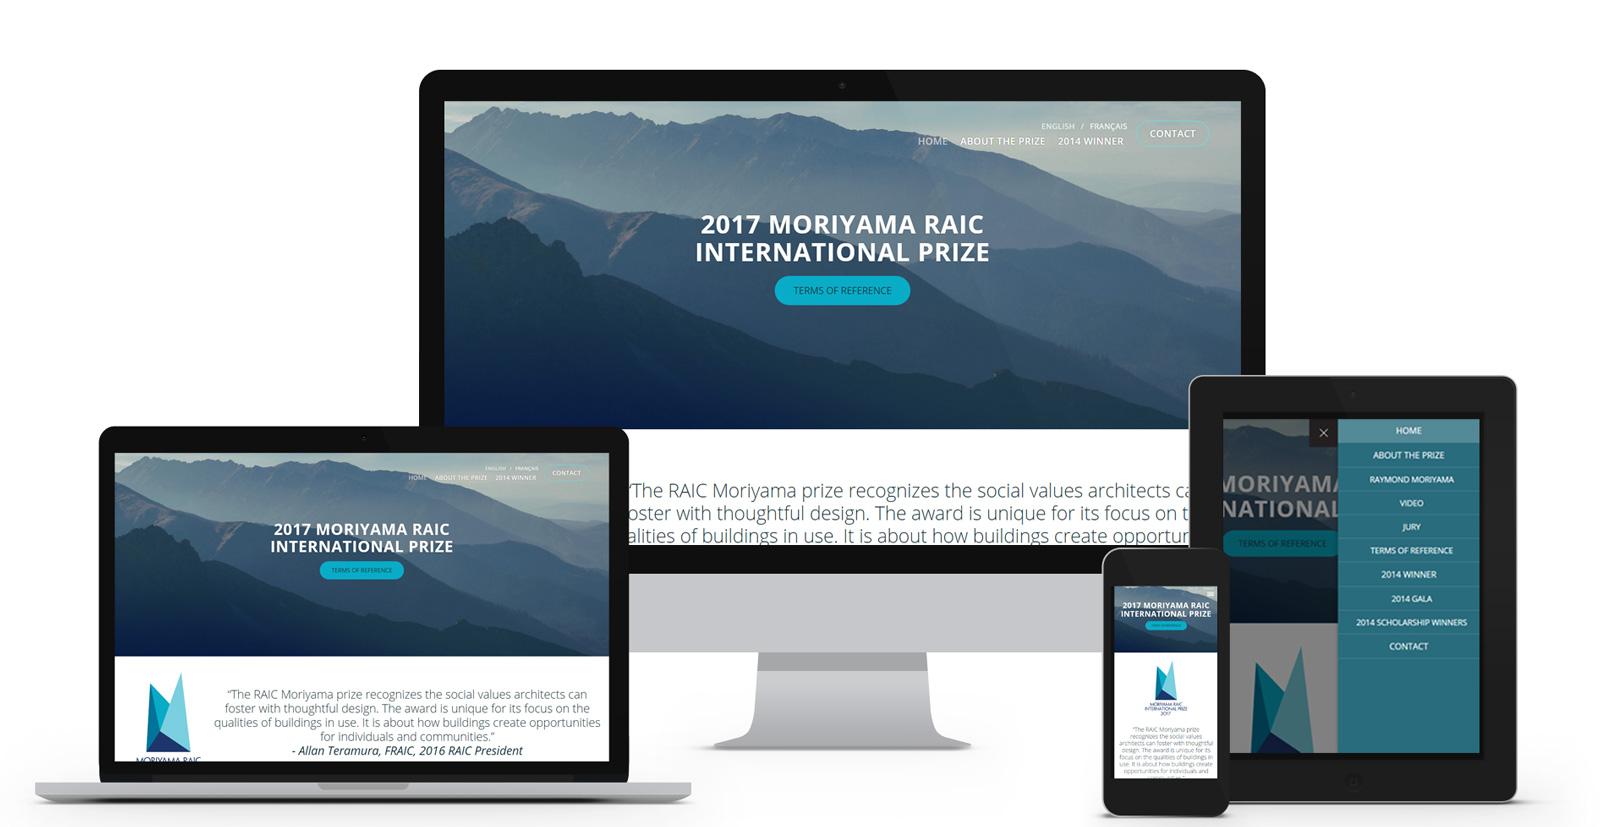 RAIC Moriyama prize -  Royal Architectural Institute of Canada